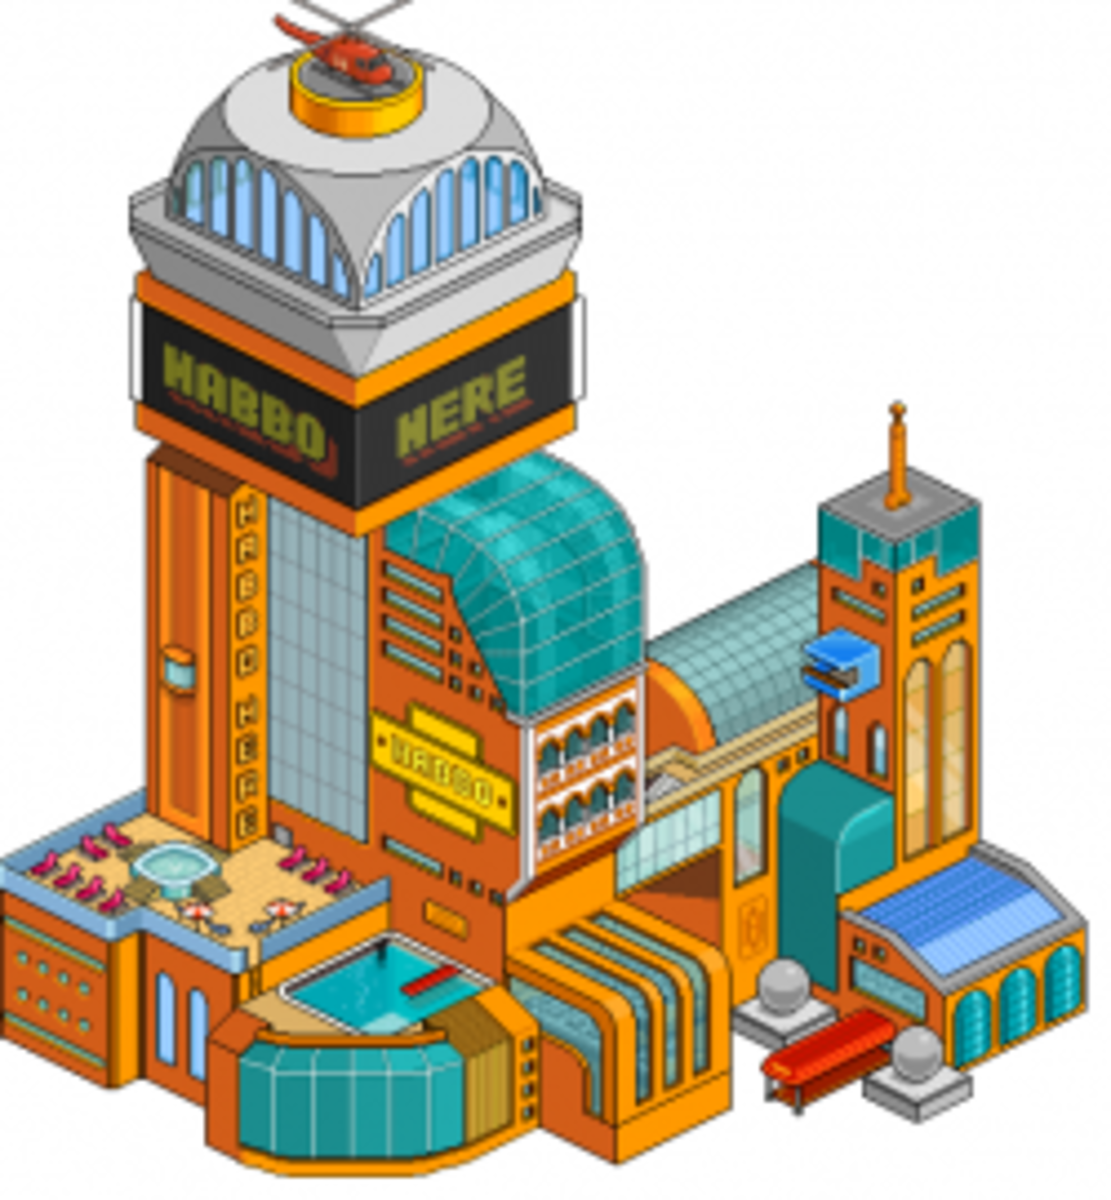 8 Games Like Habbo - Online Virtual Worlds